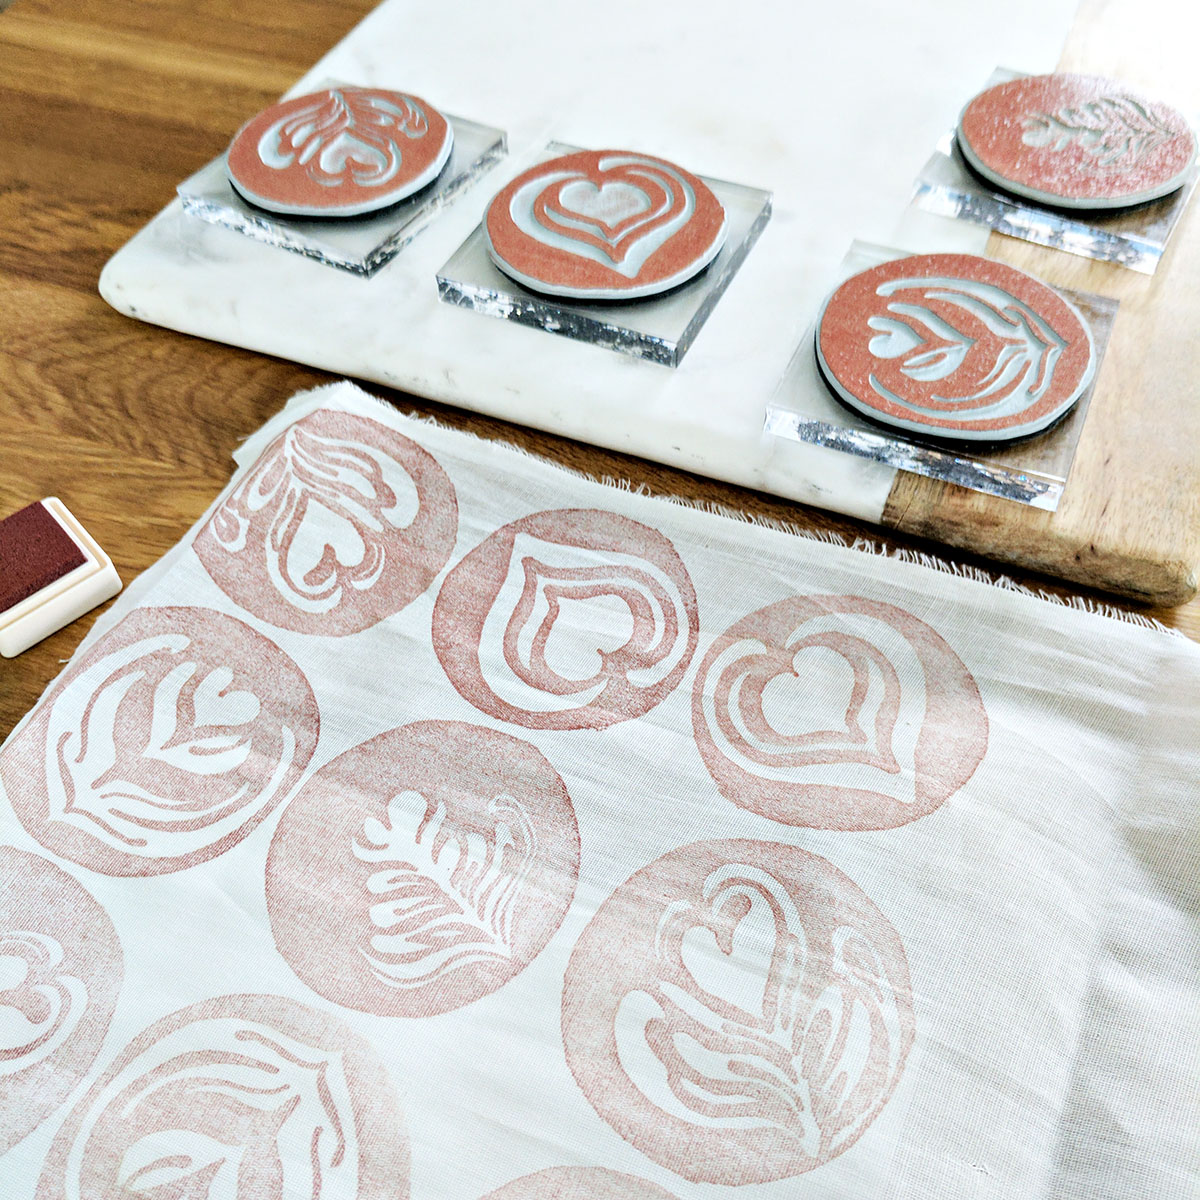 Work-in-progress shot of our Latte Art hand-stamped blanket scarf